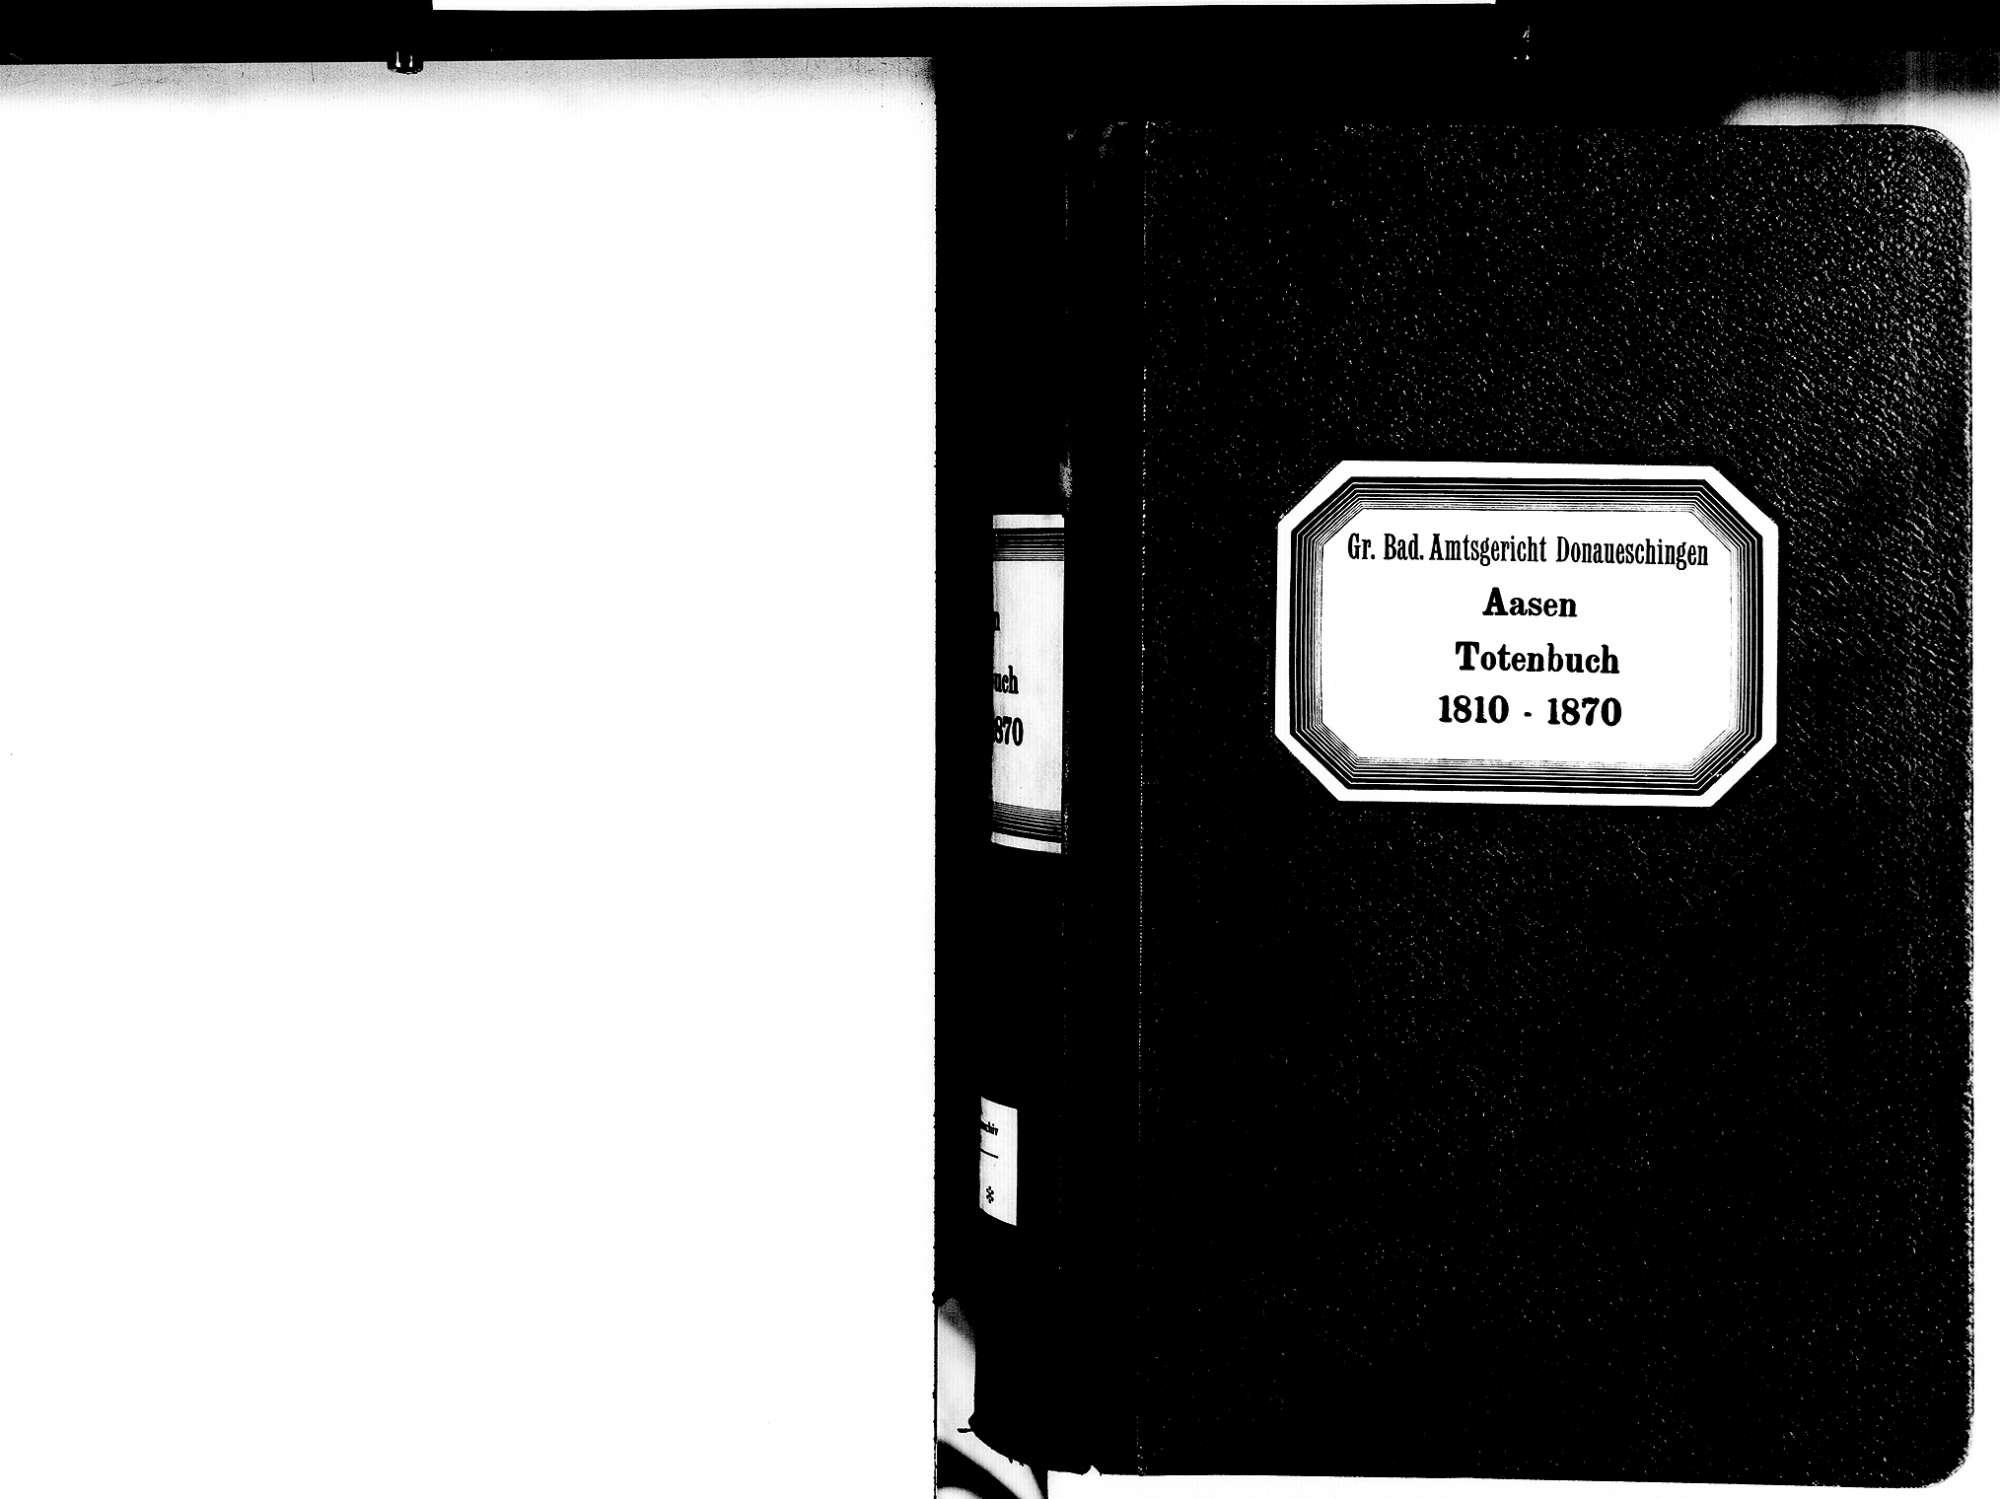 Aasen, Donaueschingen VS; Katholische Gemeinde: Sterbebuch 1810-1870, Bild 2